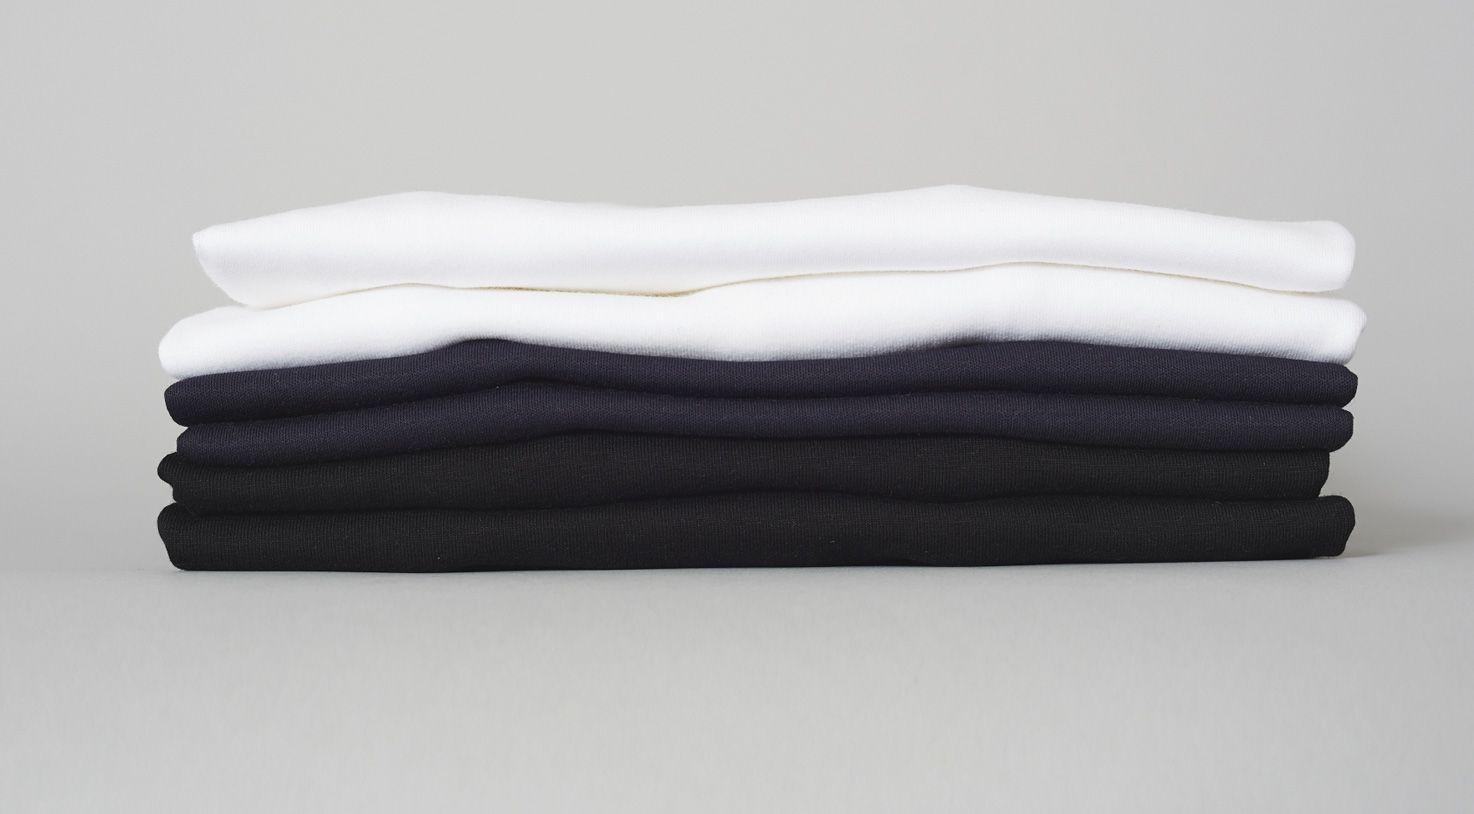 White t shirt company - The White T Shirt Co By Precept